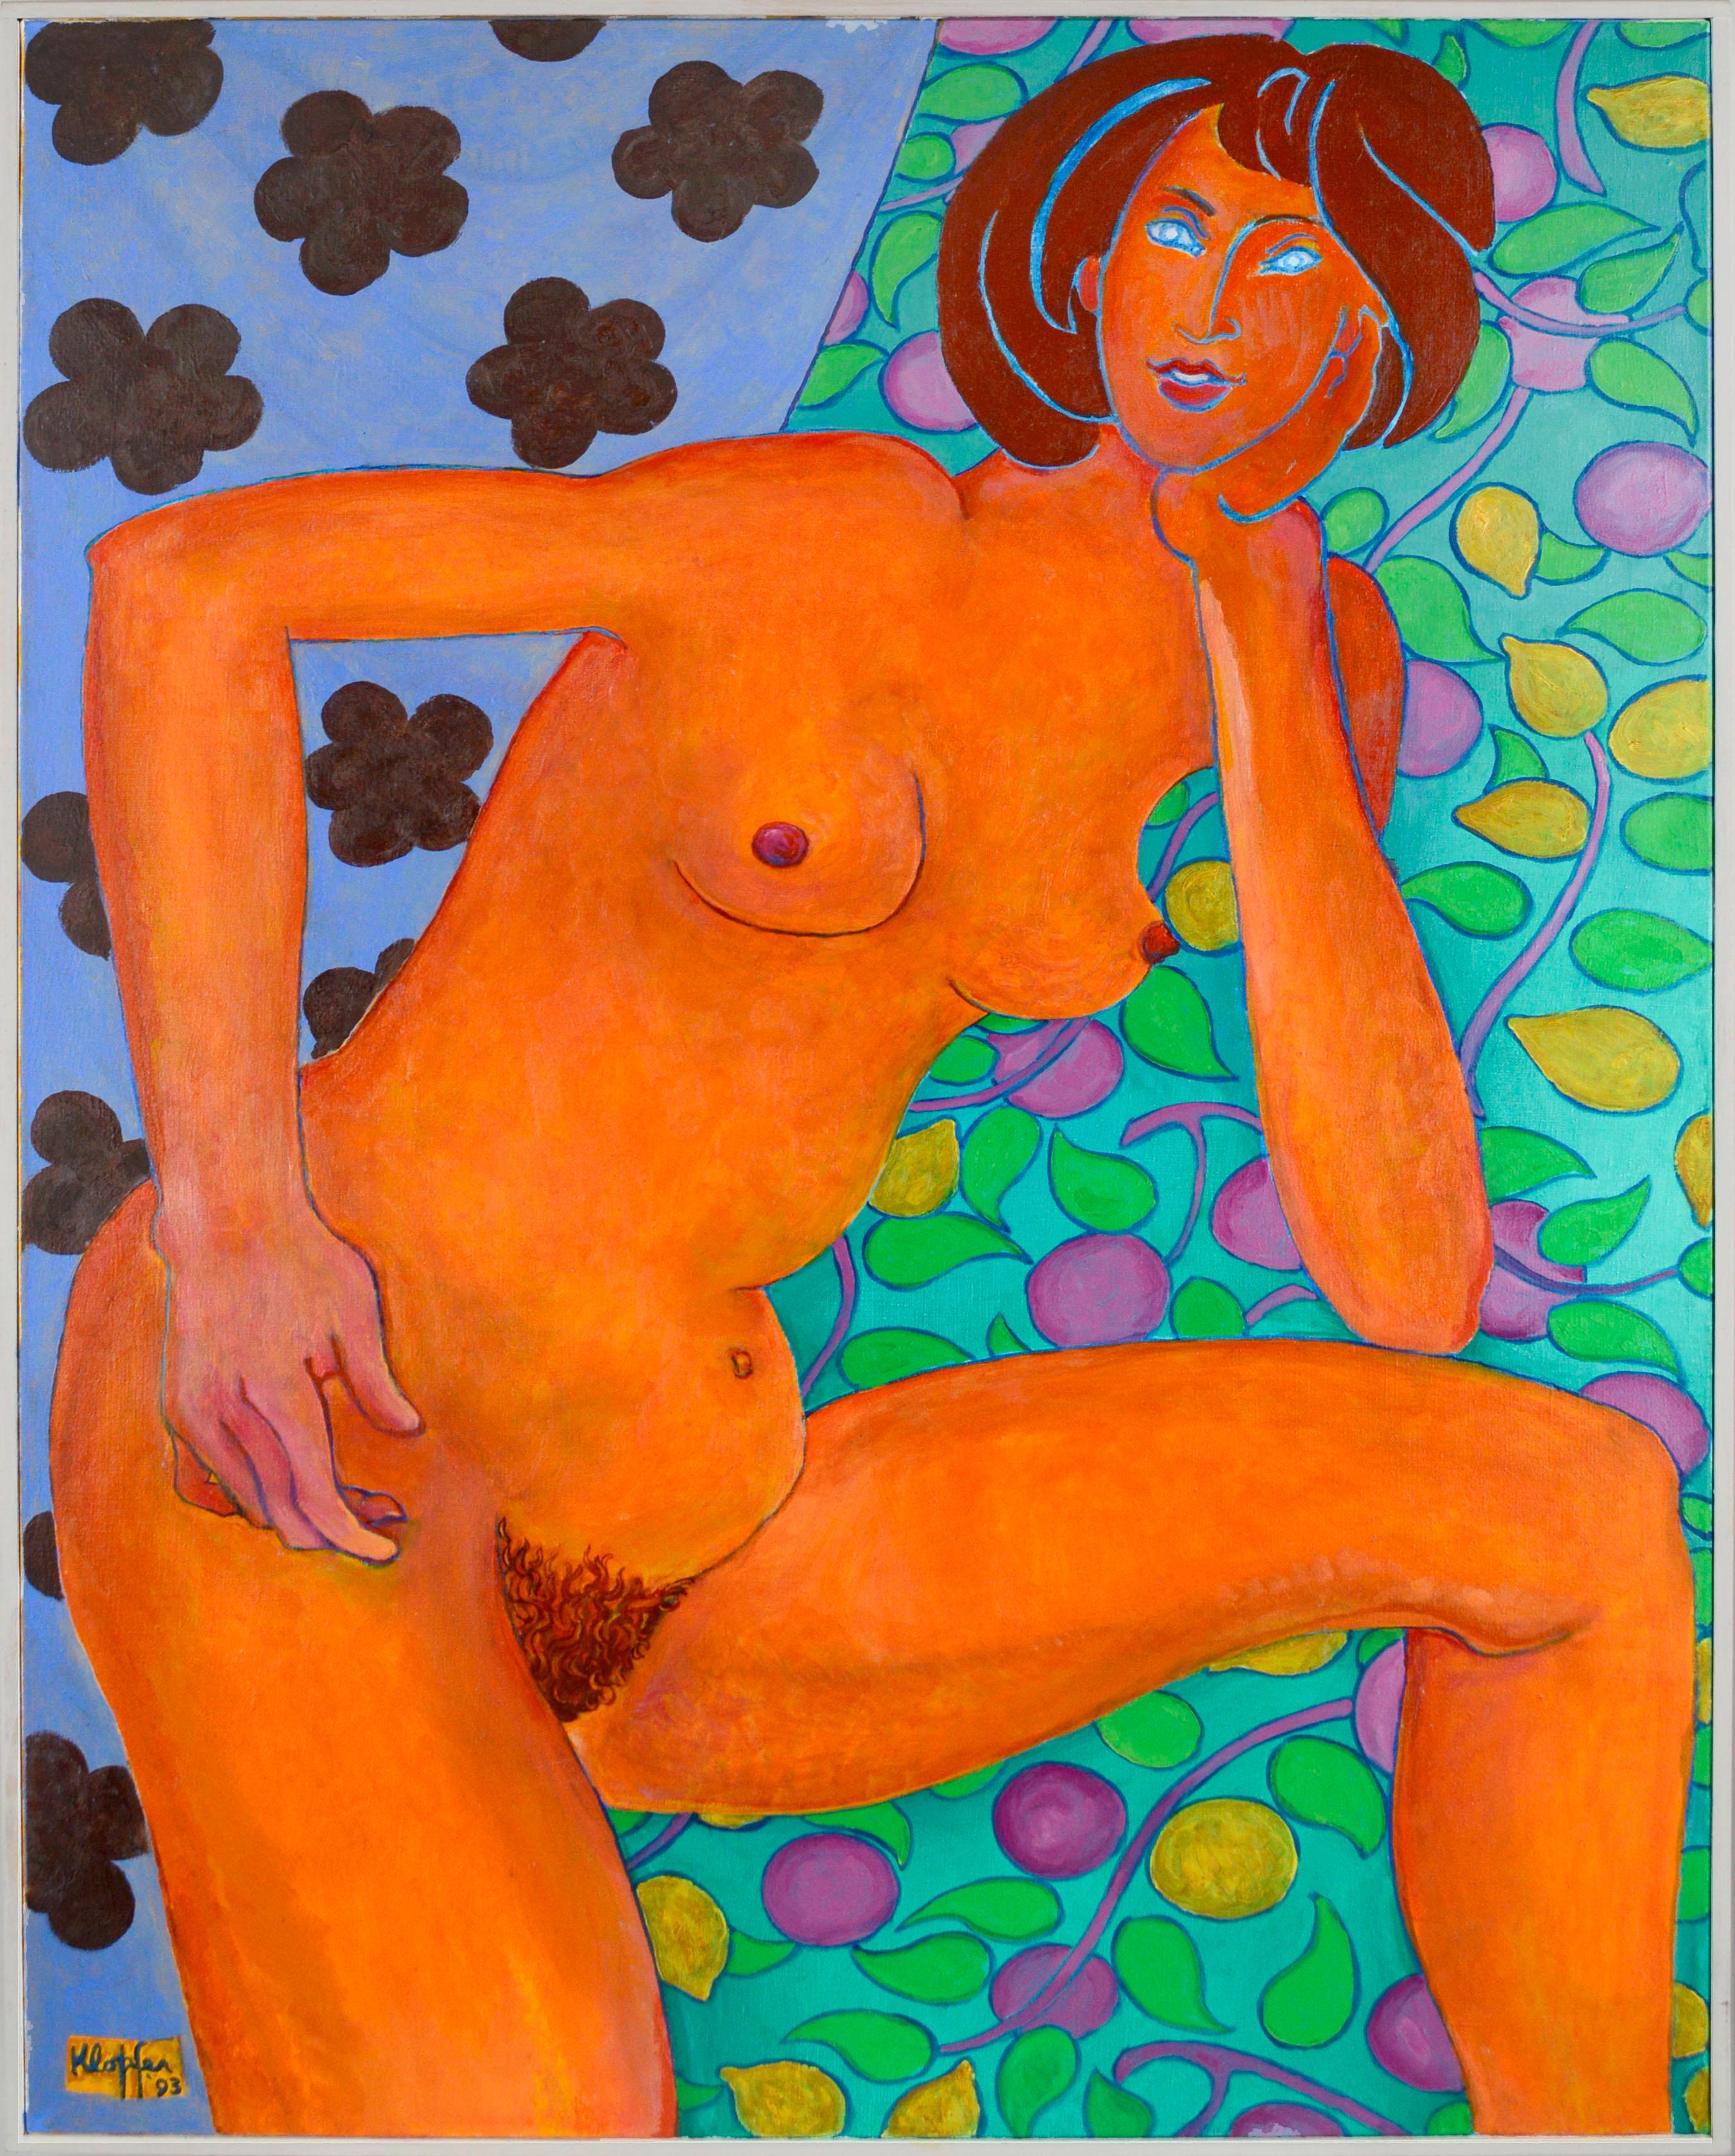 Portrait of a Woman - Fauvist Nude Figurative